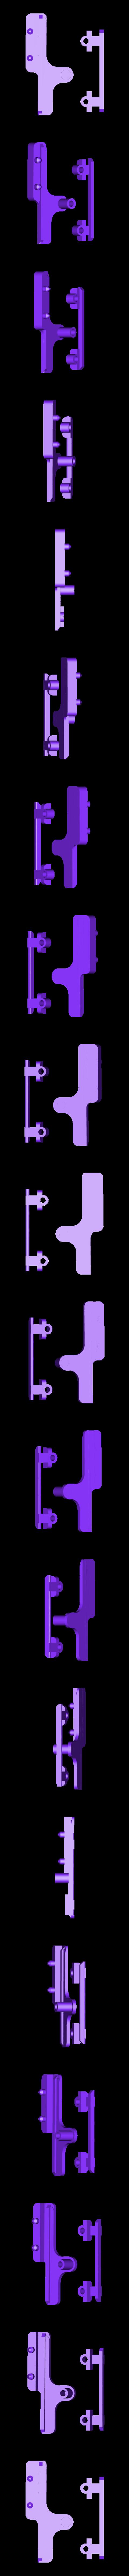 print2_carriage_covers.stl Download free STL file micro-sketch • 3D print design, ferjerez3d